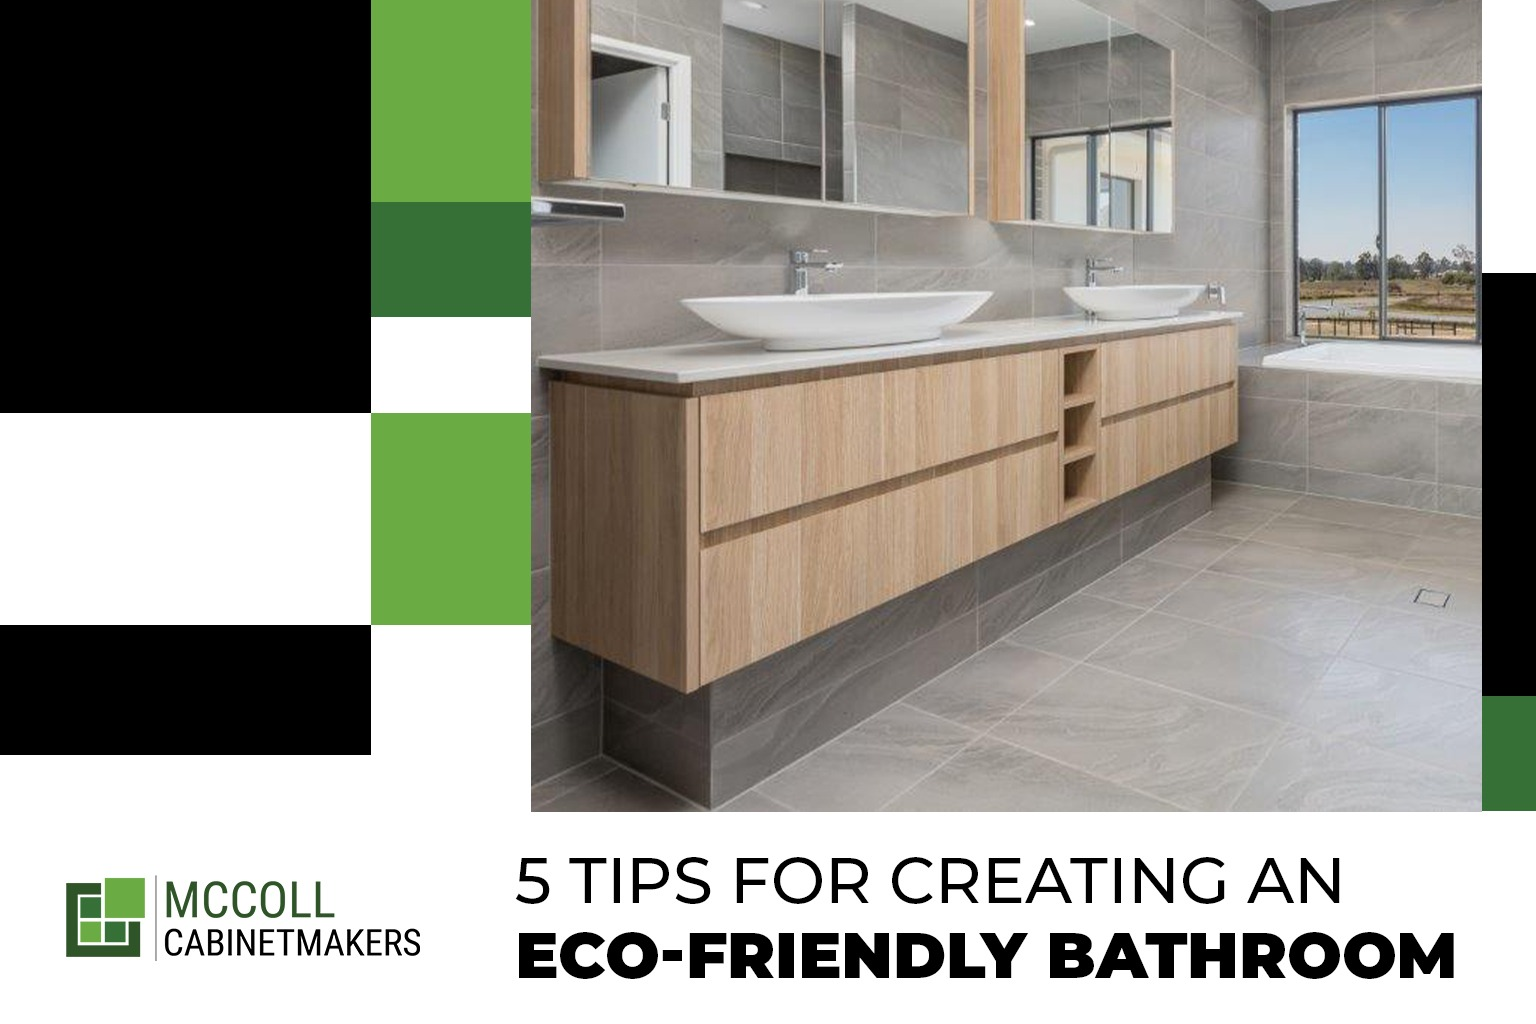 5 Tips for Creating an Eco-Friendly Bathroom